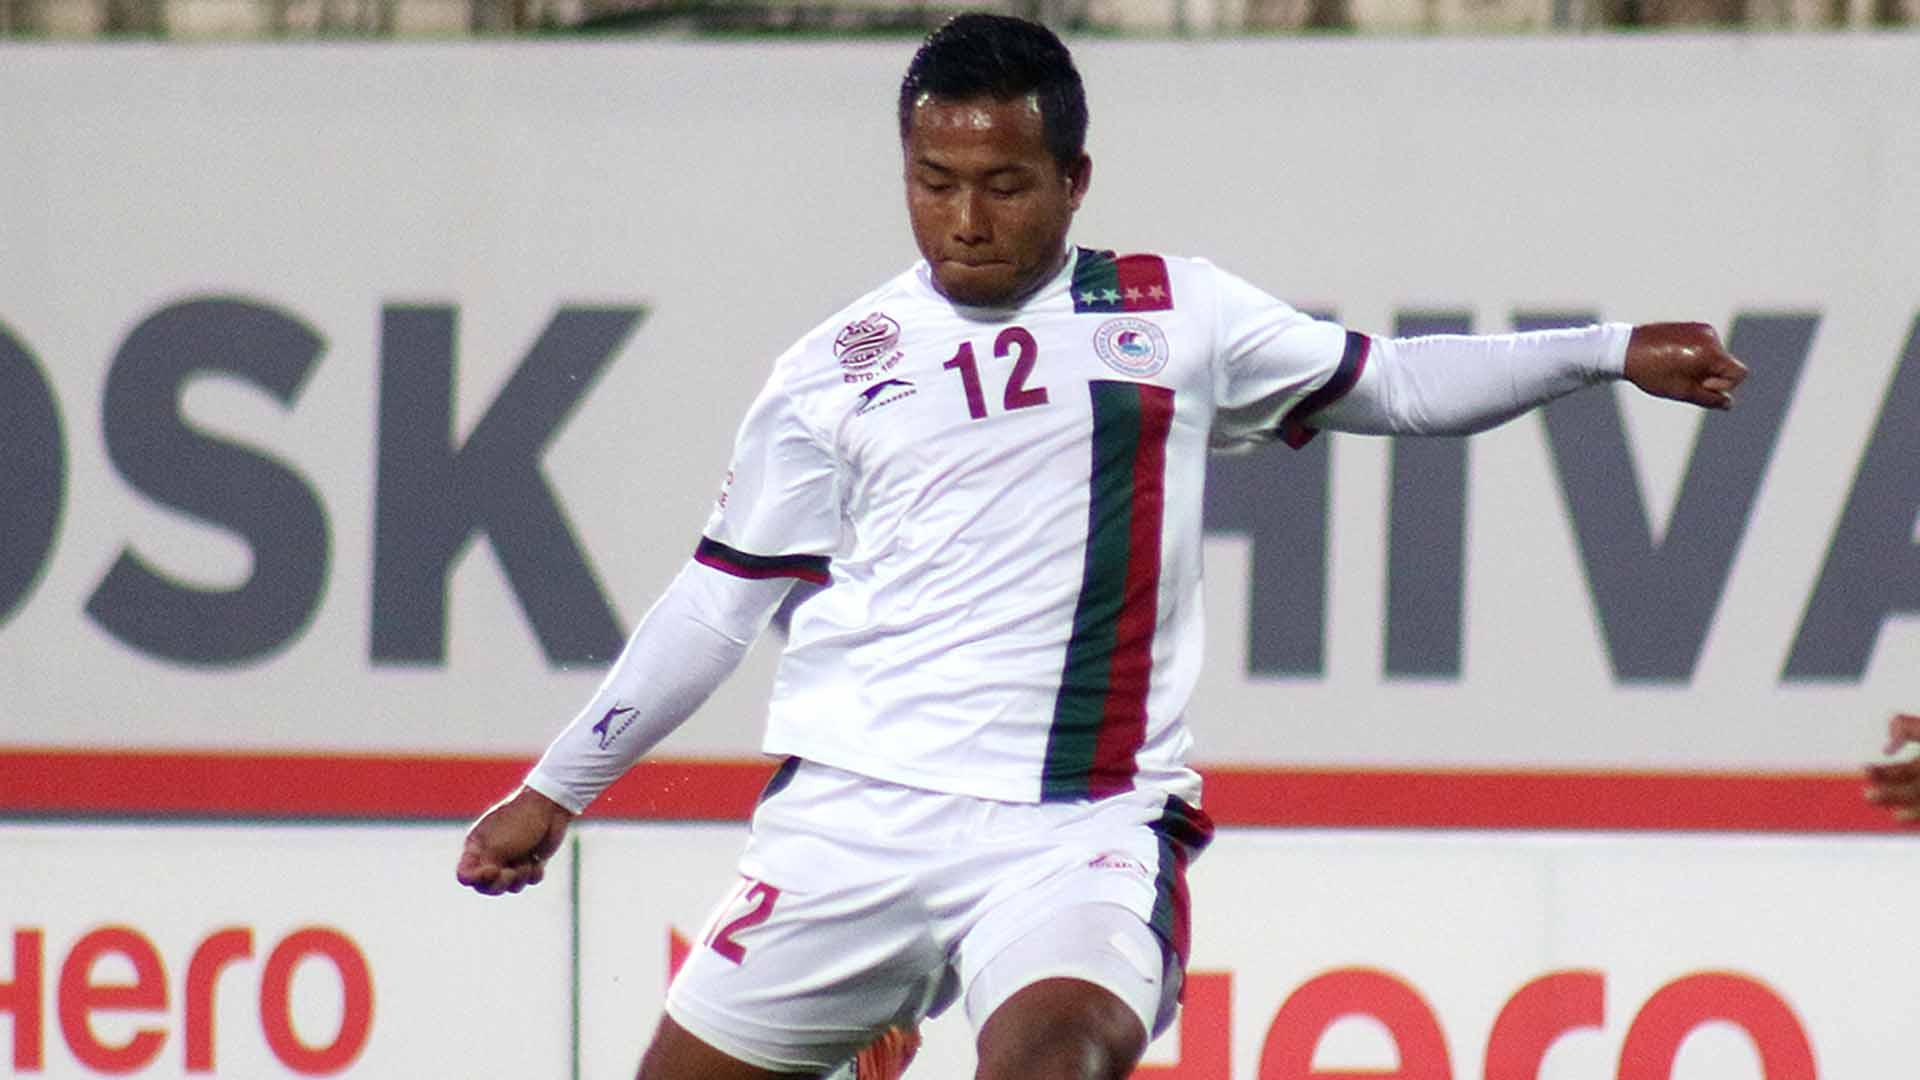 Jeje Lalpekhlua DSK Shivajians Mohun Bagan I-League 2017